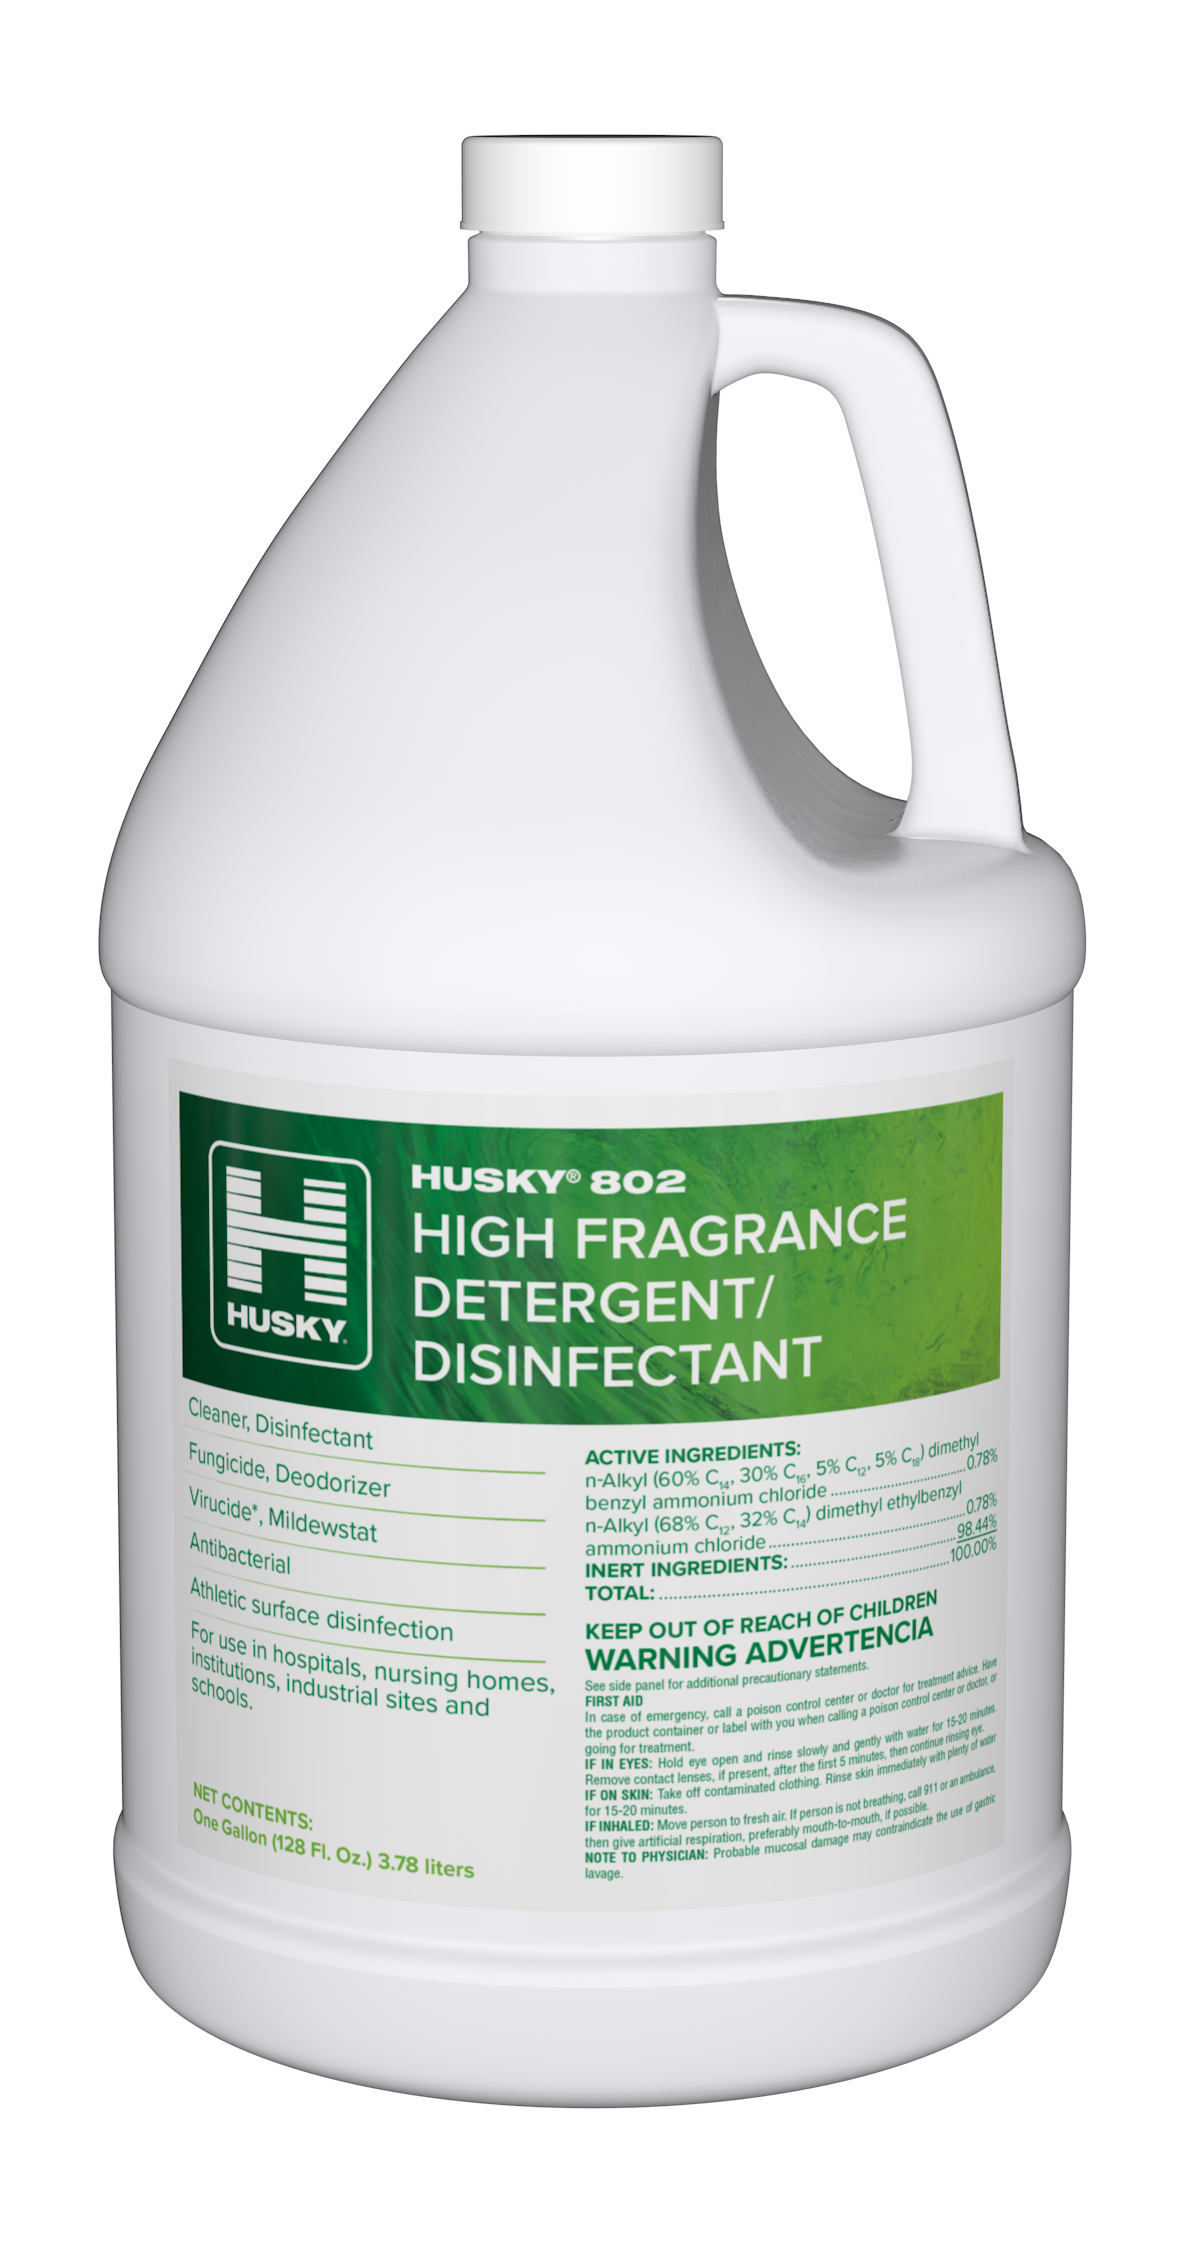 Husky 802 High Fragrance Mint Detergent/Disinfectant - 1 Gallon (128 fl oz)